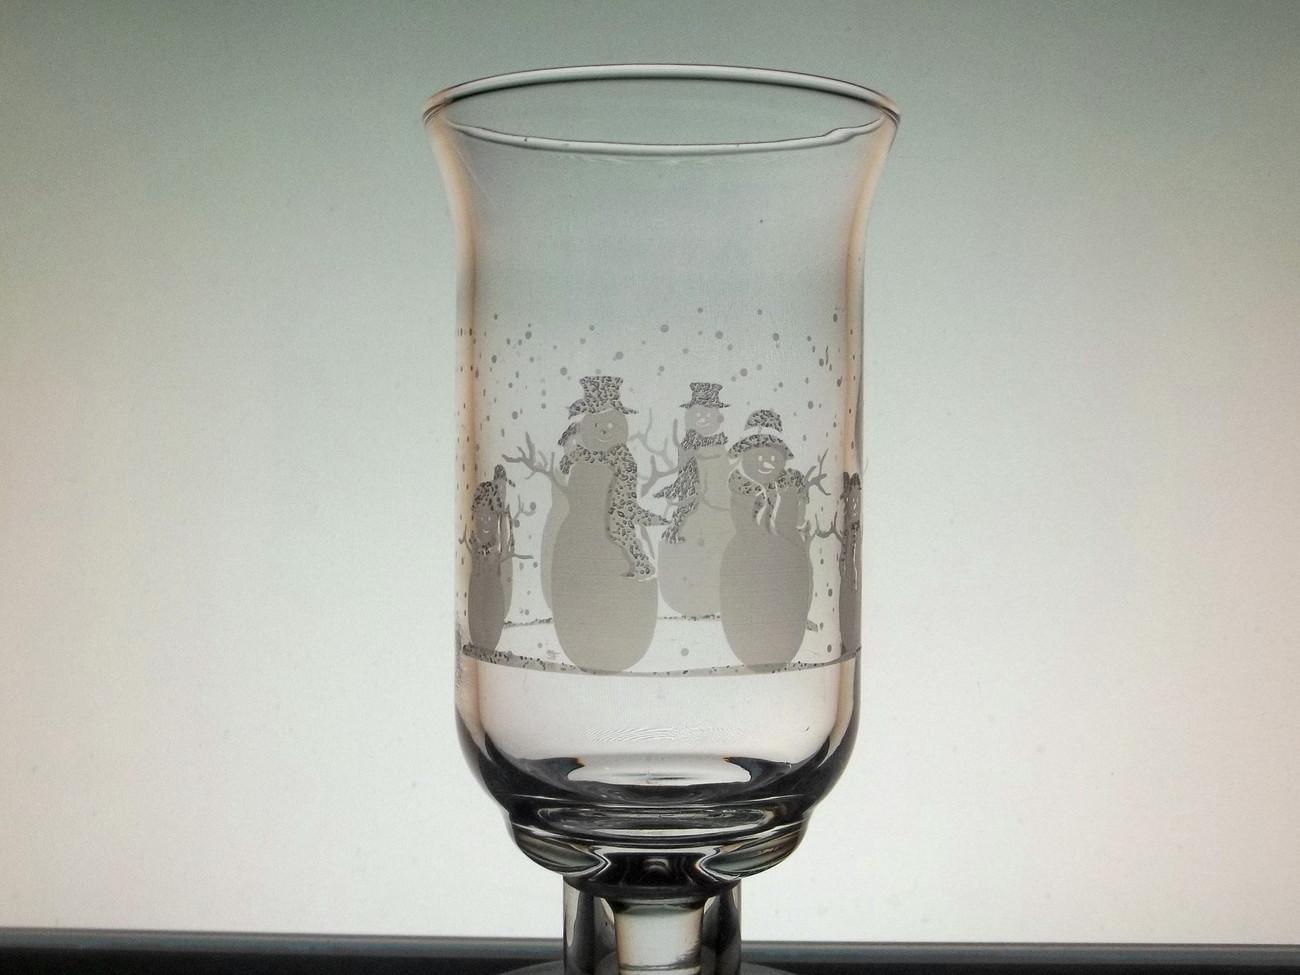 Home Interiors Peg Votive Holder Cup Glass Snowman Family